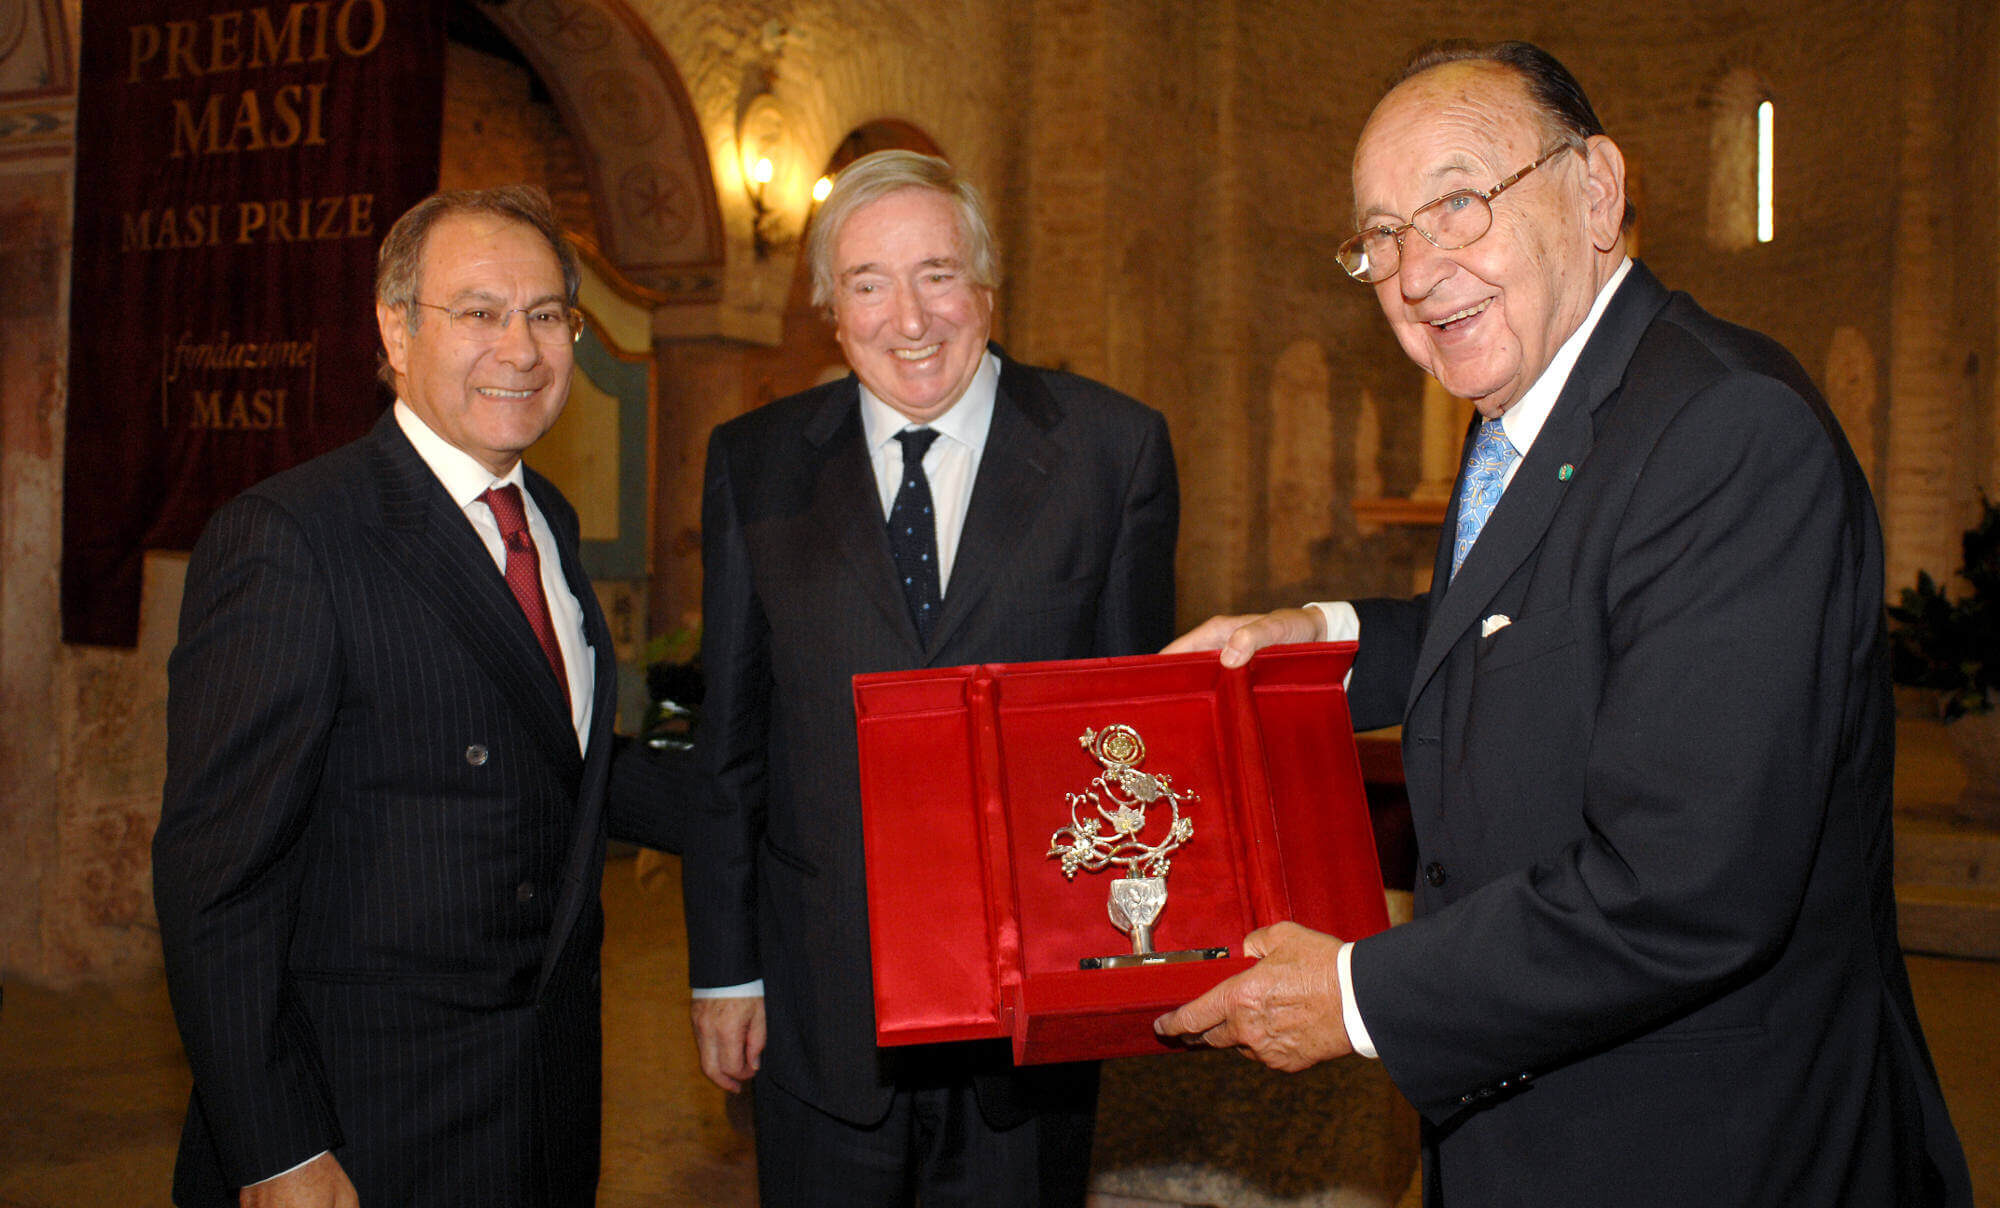 Hans-Dietrich Genscher - Grosso d'oro veneziano 2007